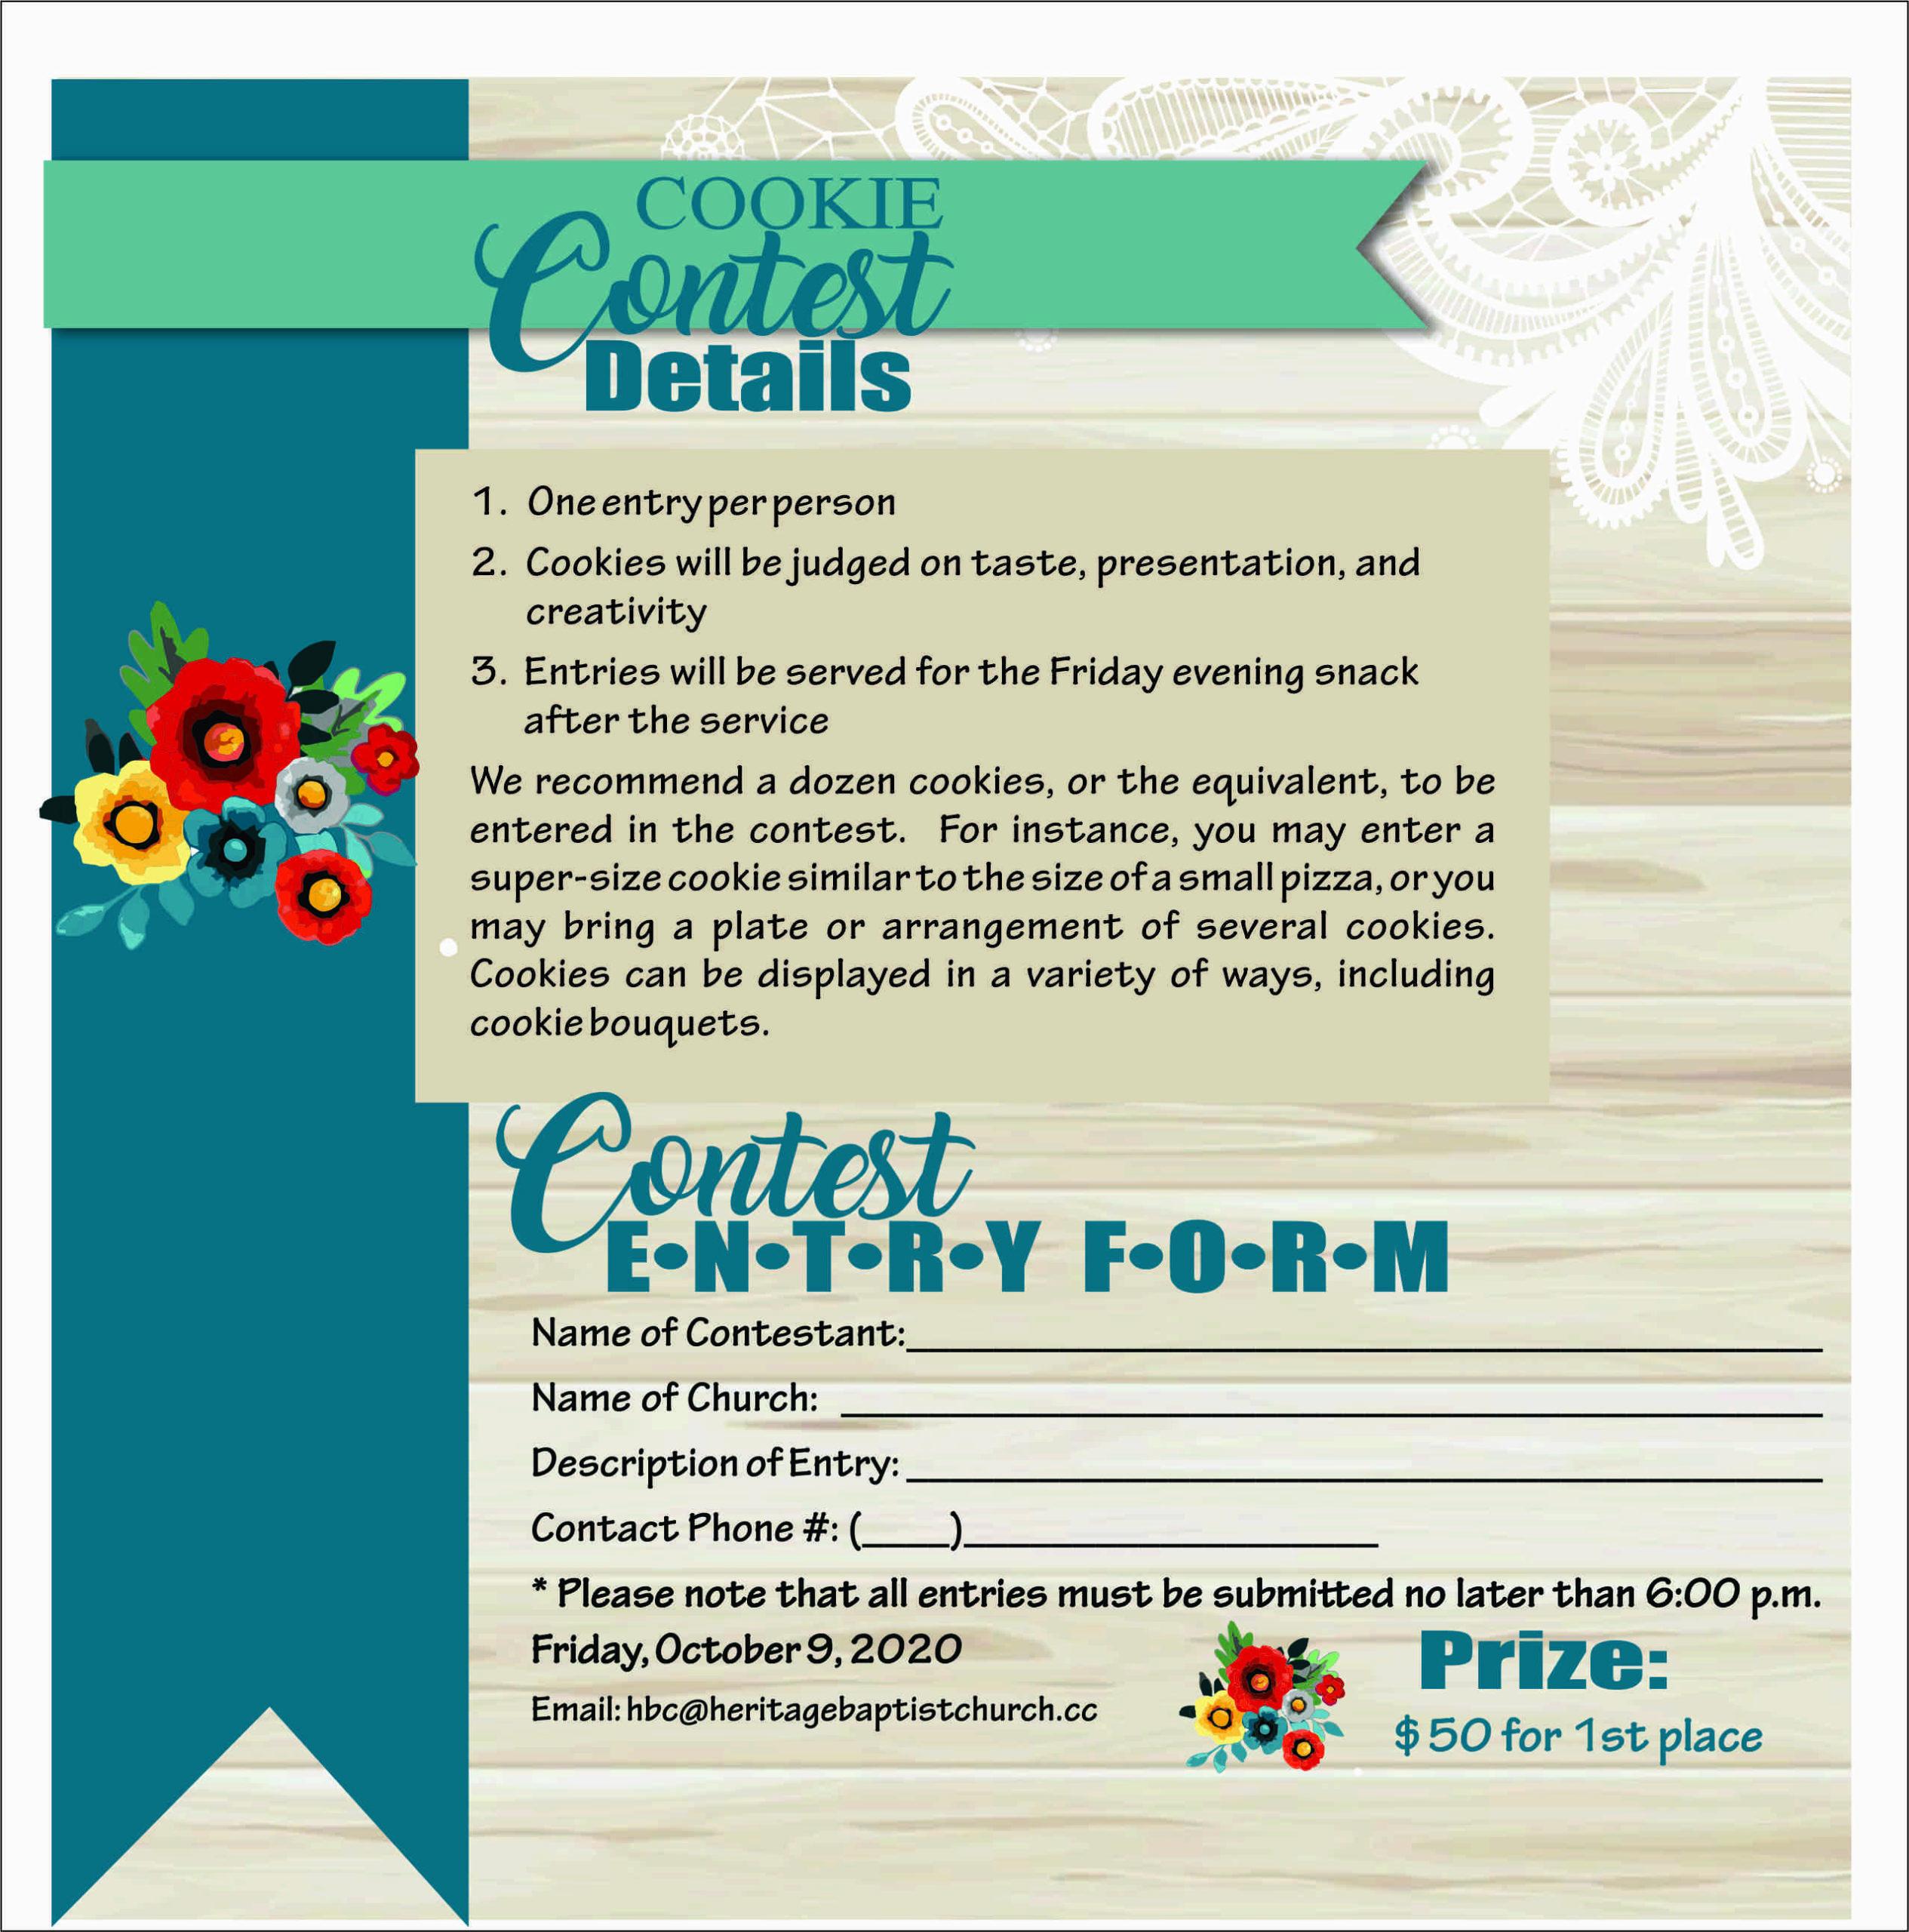 Cookie Contest details